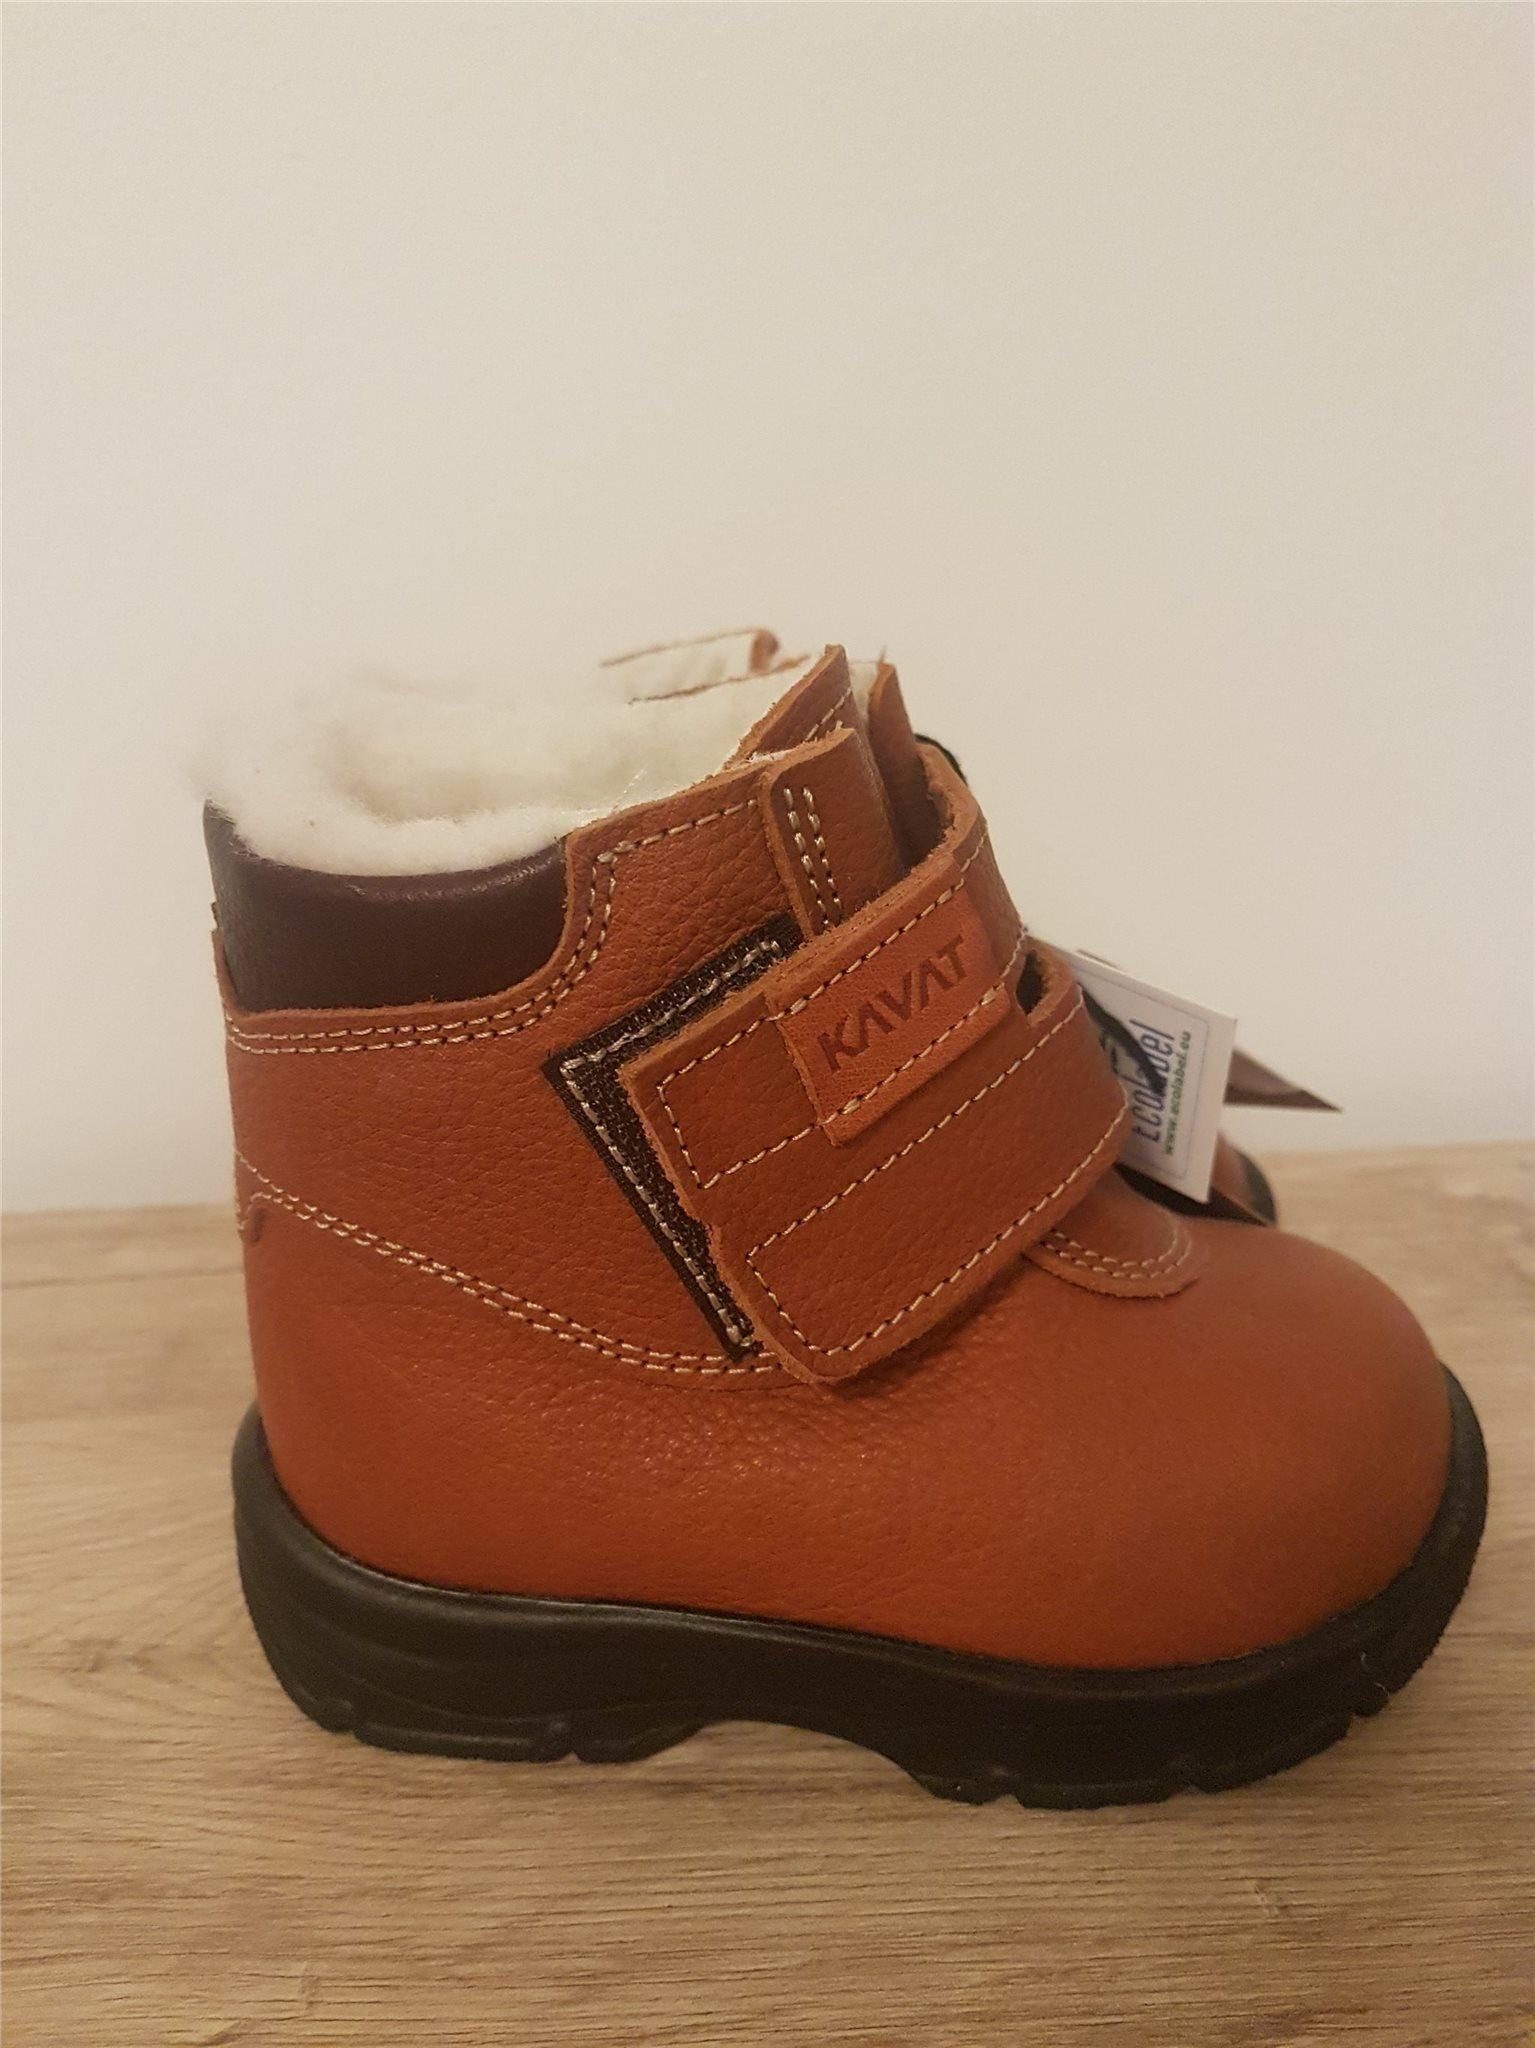 64cd3eddaff Yxhult EP Light brown, KAVAT, kängor/boots i st.. (343995628) ᐈ Köp ...